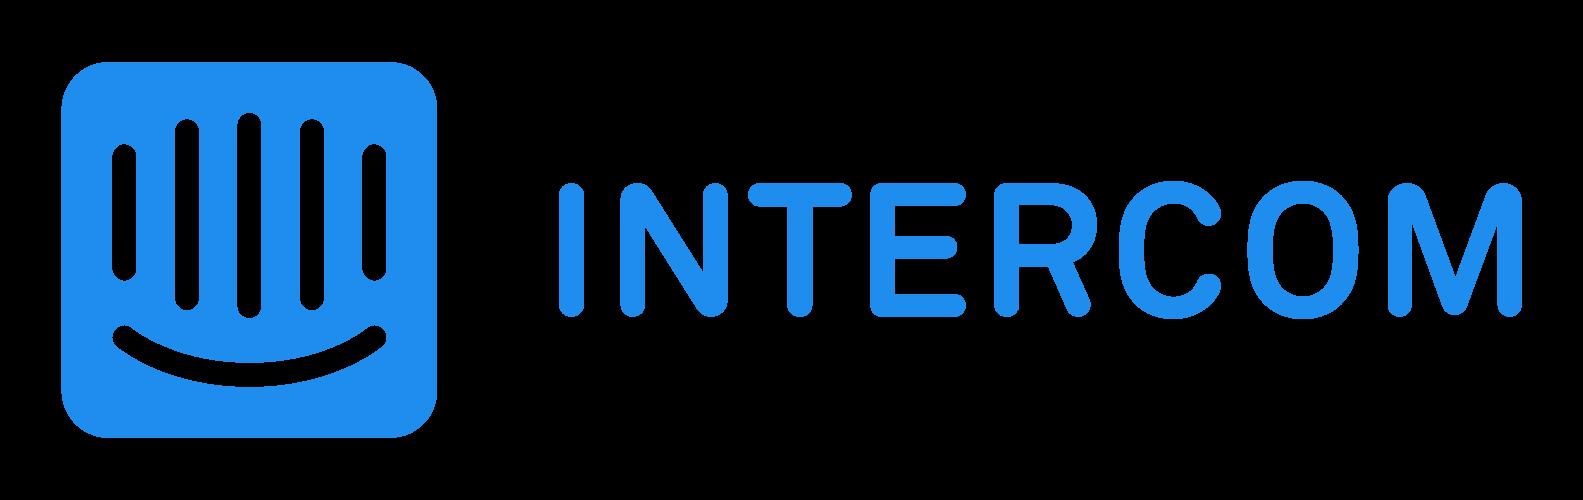 SaaS Integration: Intercom